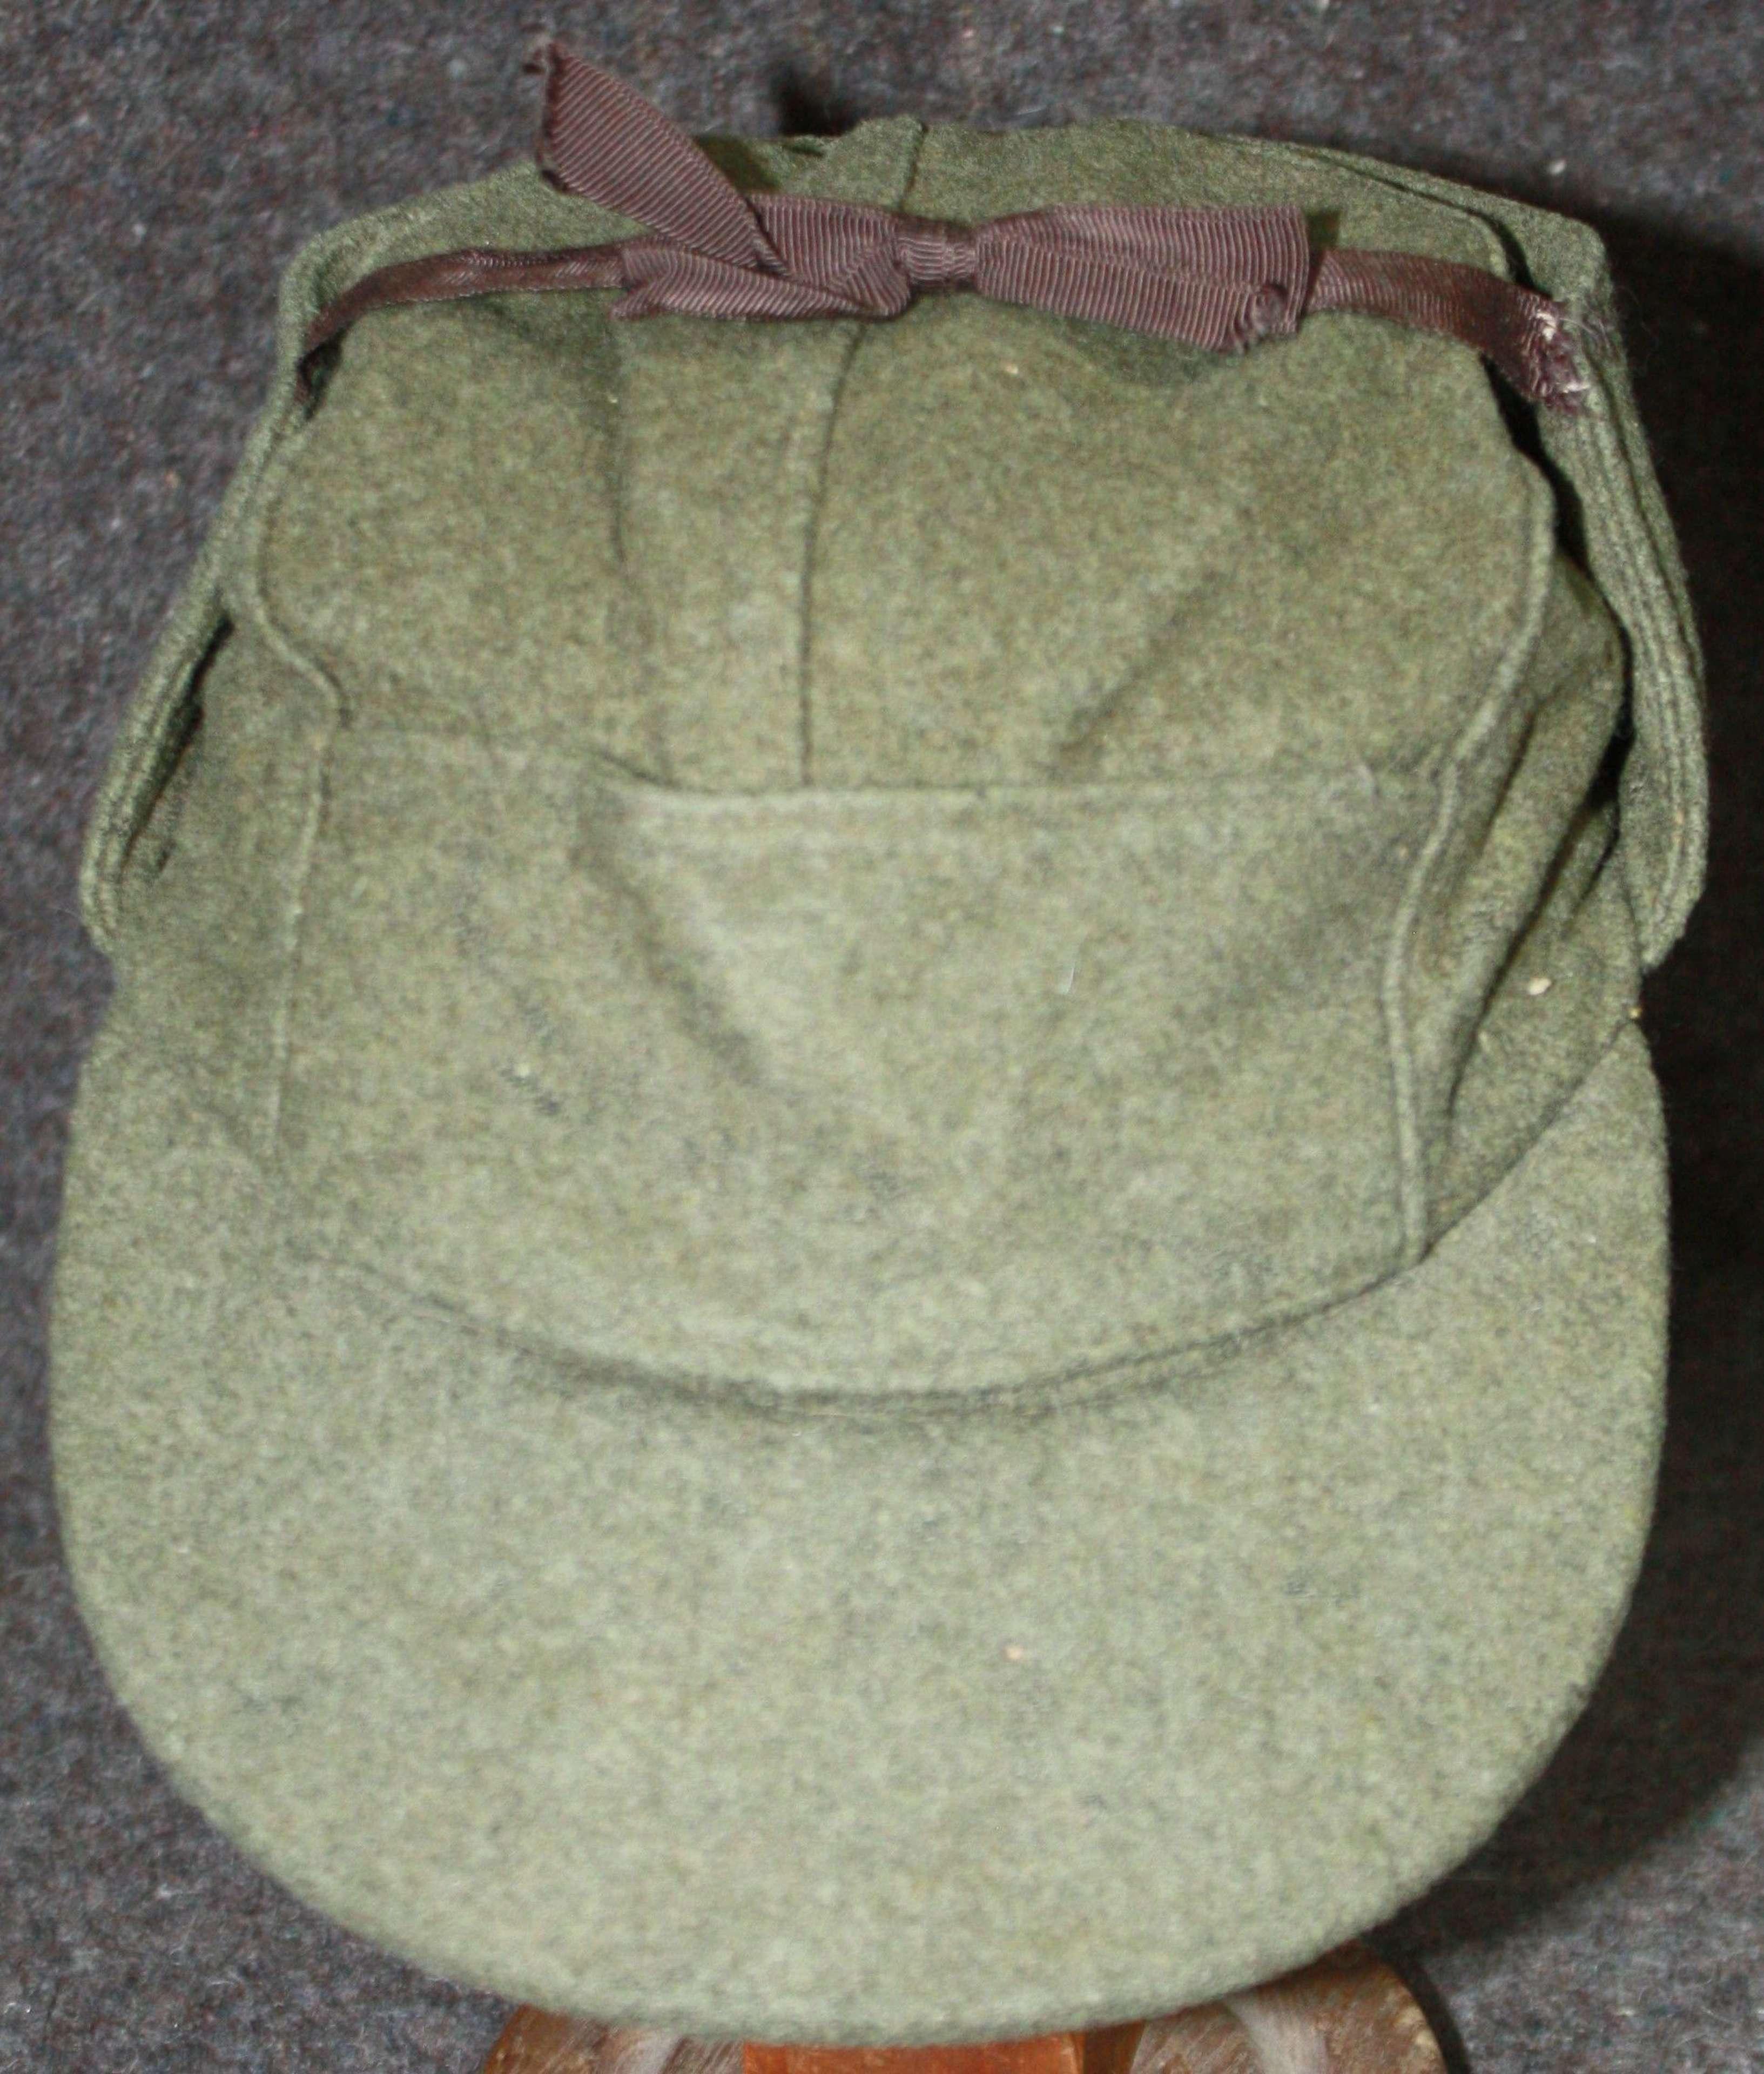 A WWII CANADIAN DMC CAP 1943 DATED